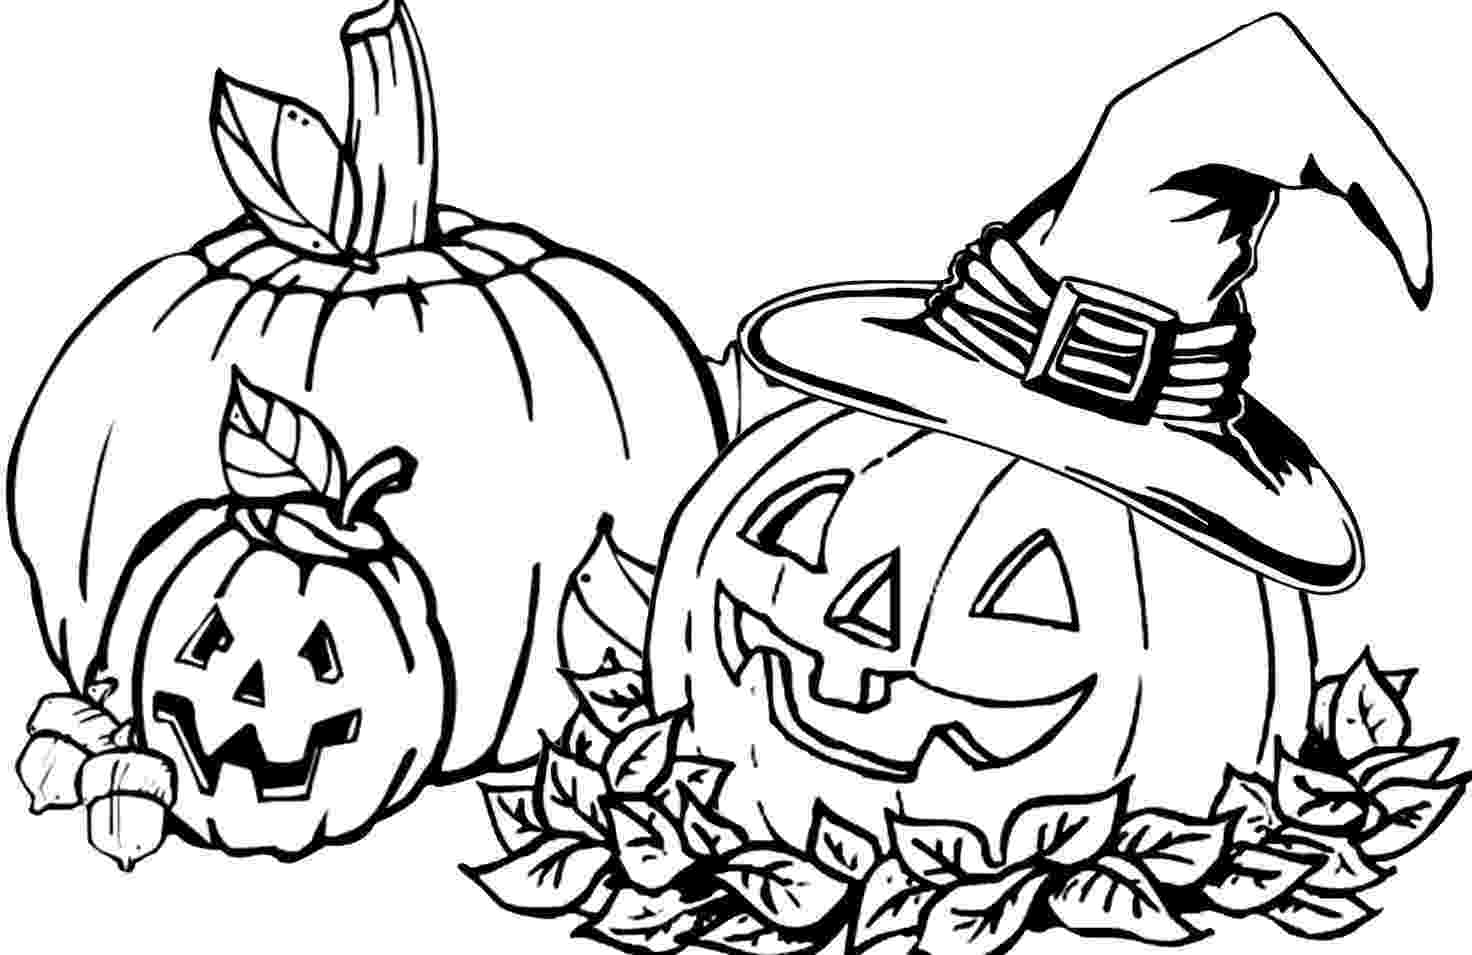 pumpkin colouring sheet learn and grow designs website how to draw a pumpkin pumpkin sheet colouring